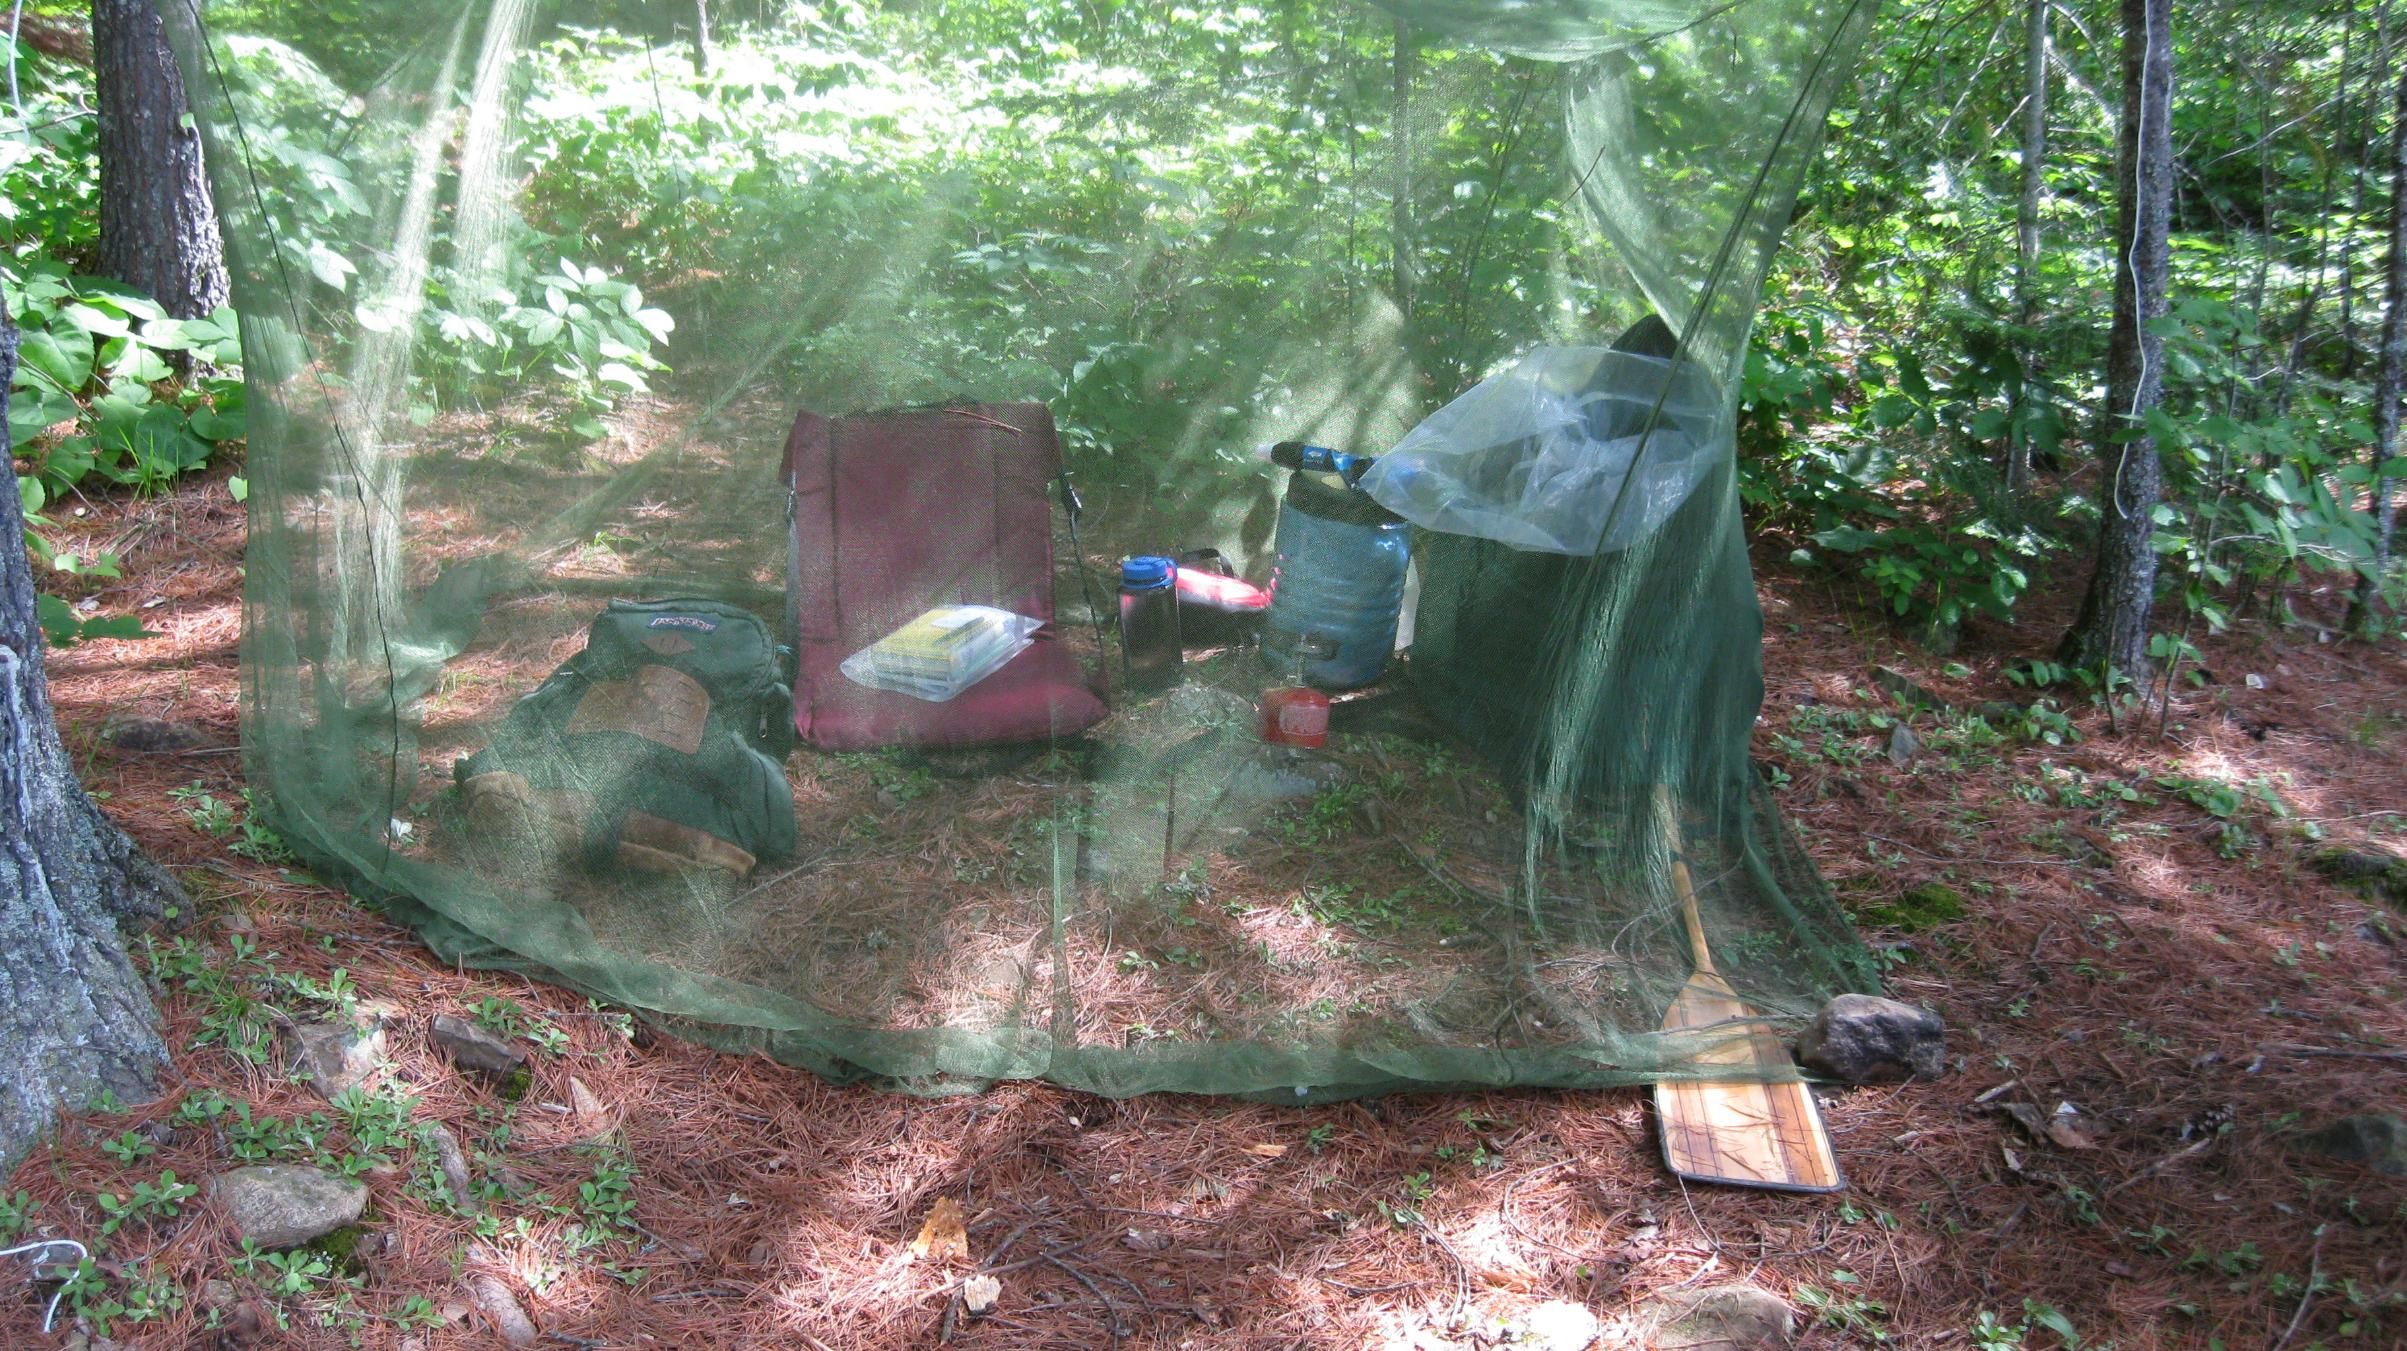 Bwca Screen Tents Boundary Waters Gear Forum